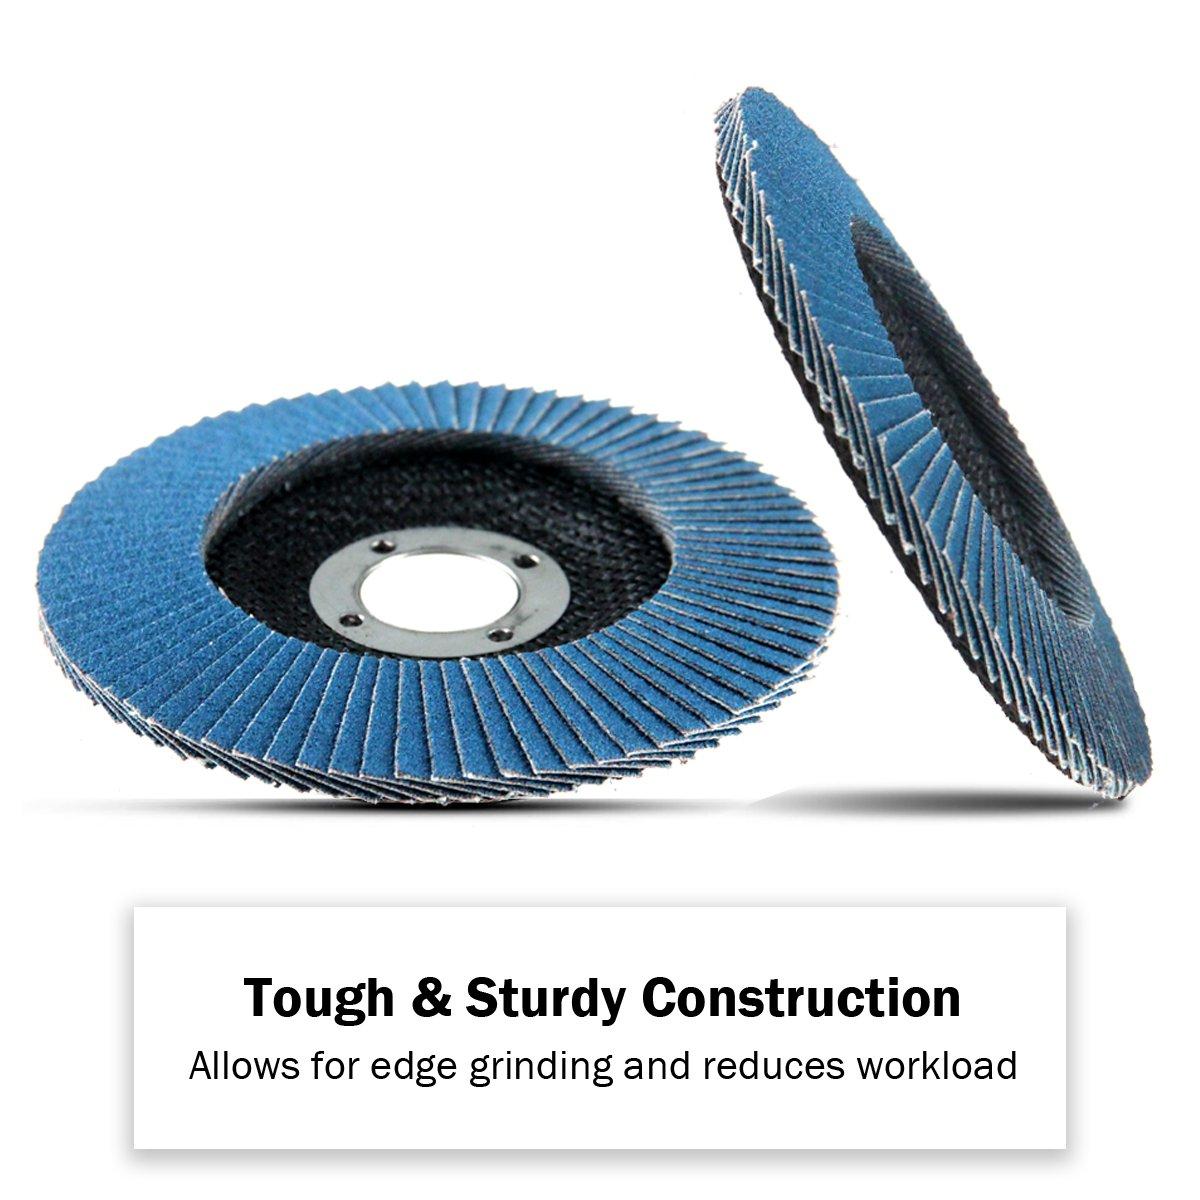 KSEIBI Zirconia Corundum 4 1/2 Inch Flap Disc Sanding Grinding Wheel (Grit #40, Blue) by KSEIBI (Image #3)